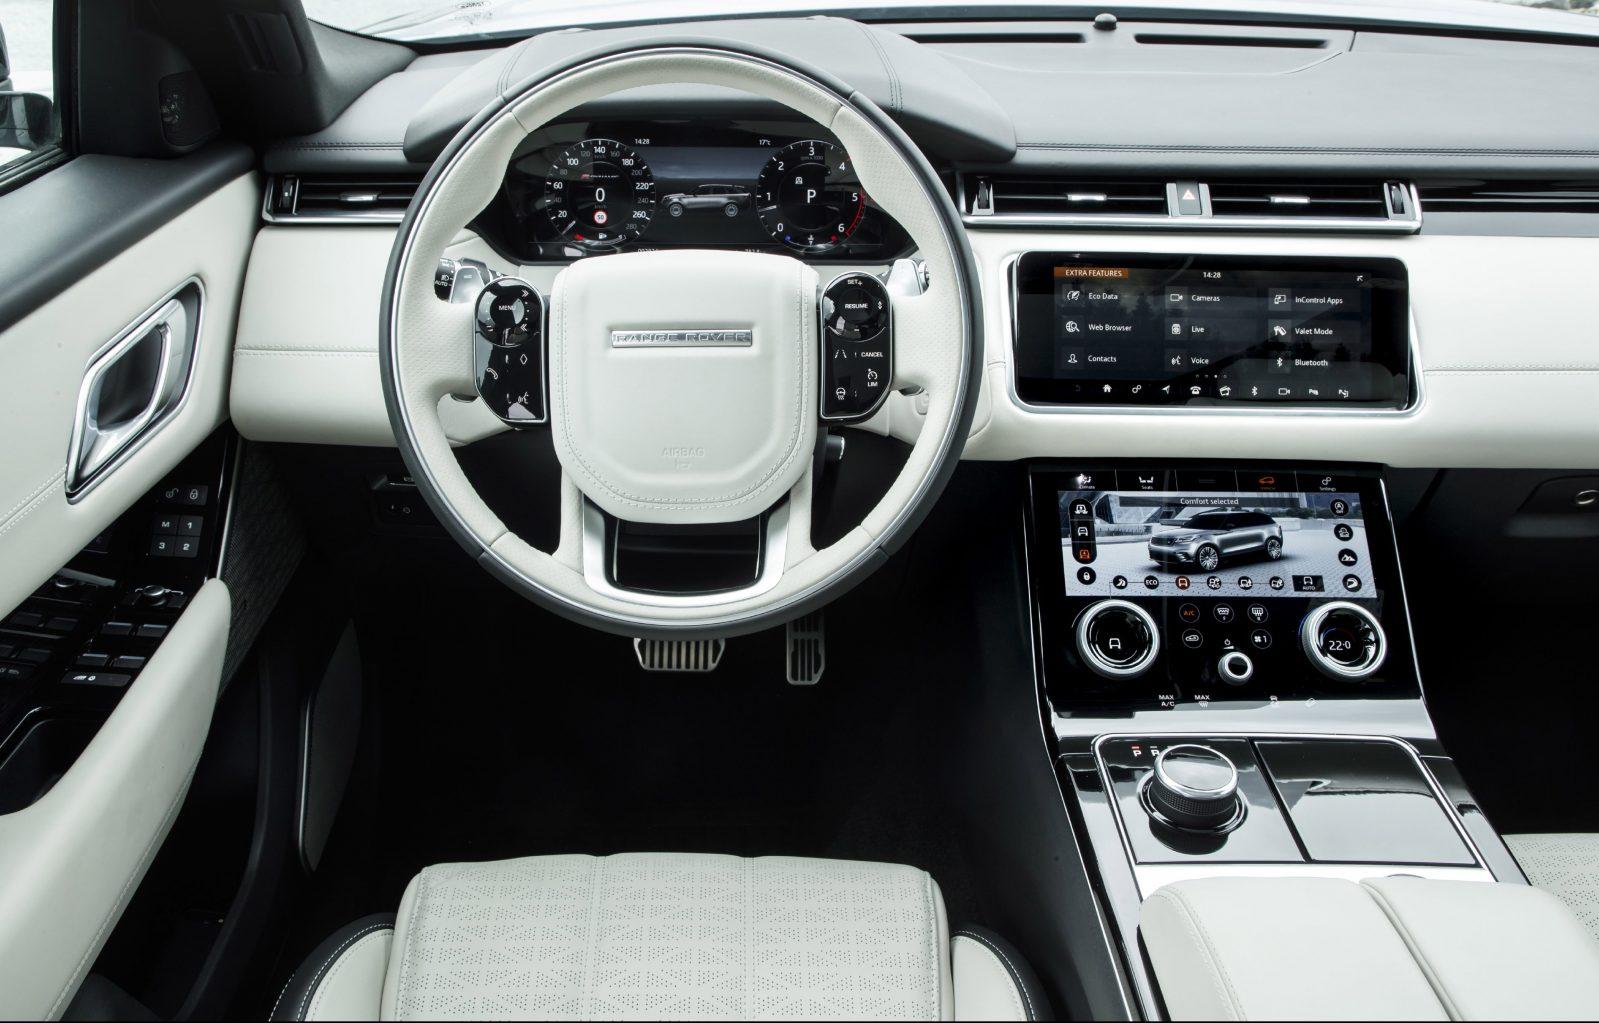 Range Rover Velar1st Edition R-Dynamic interior